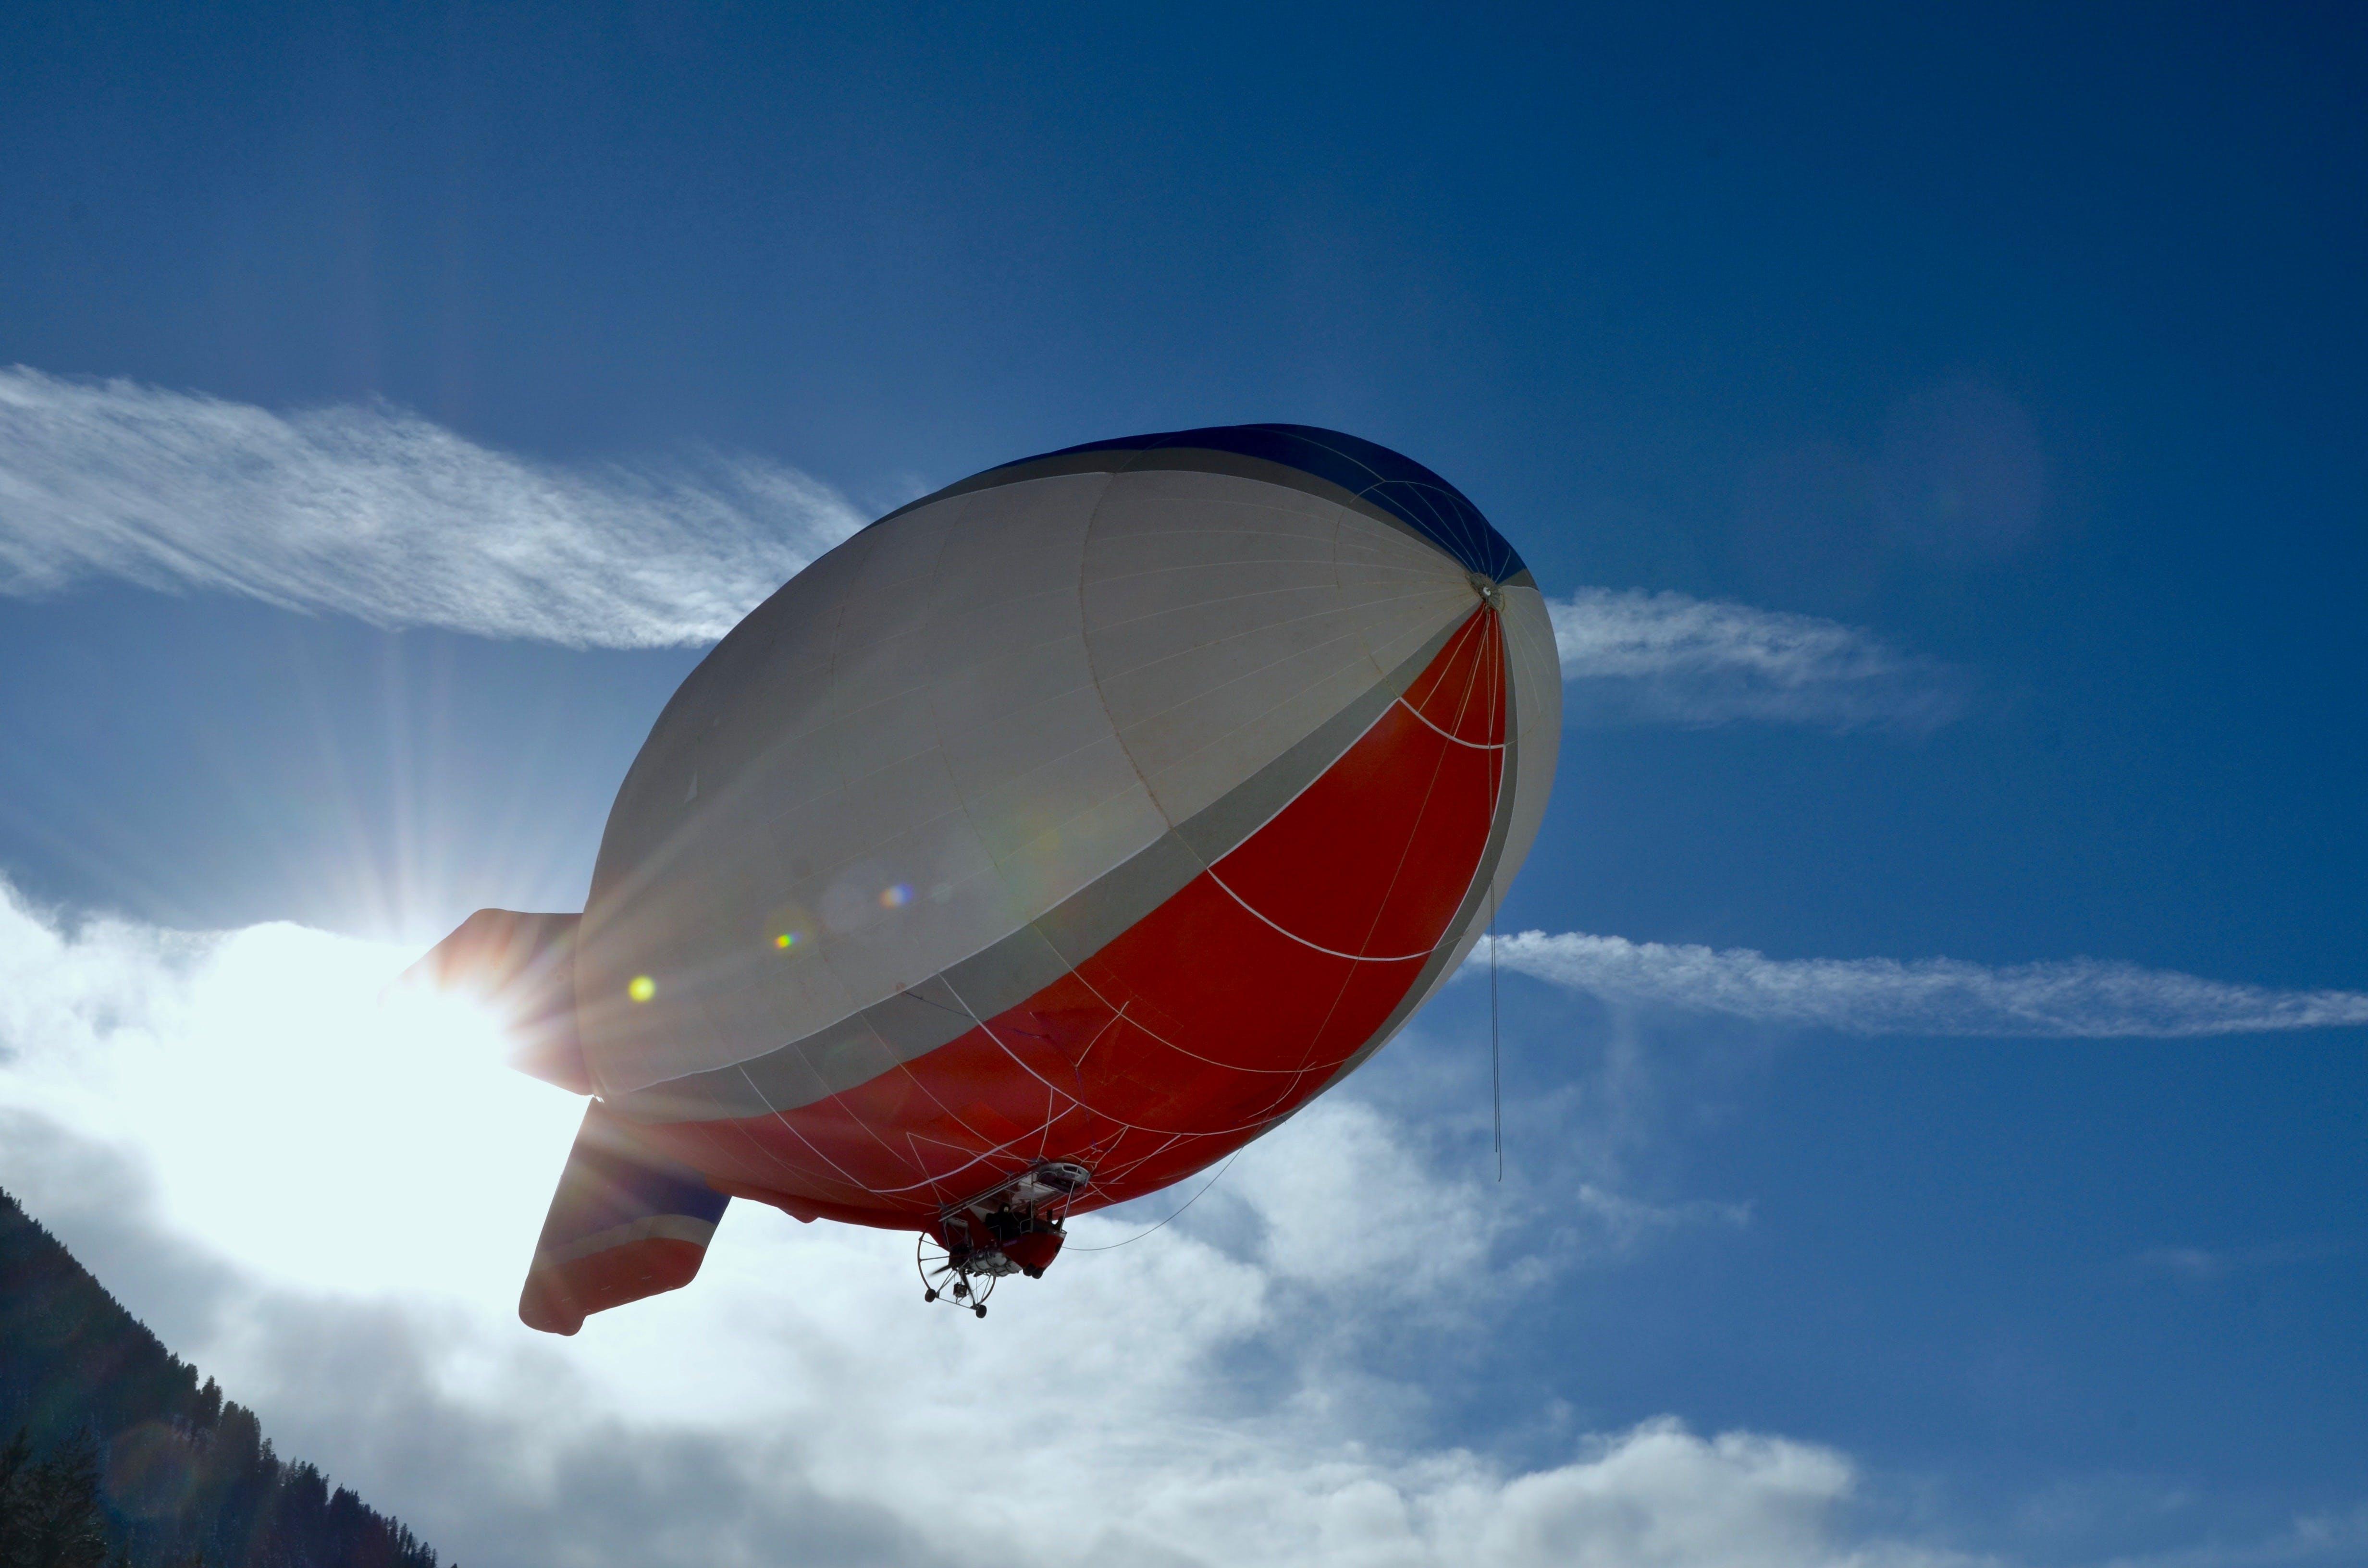 White and Red Blimp Flying